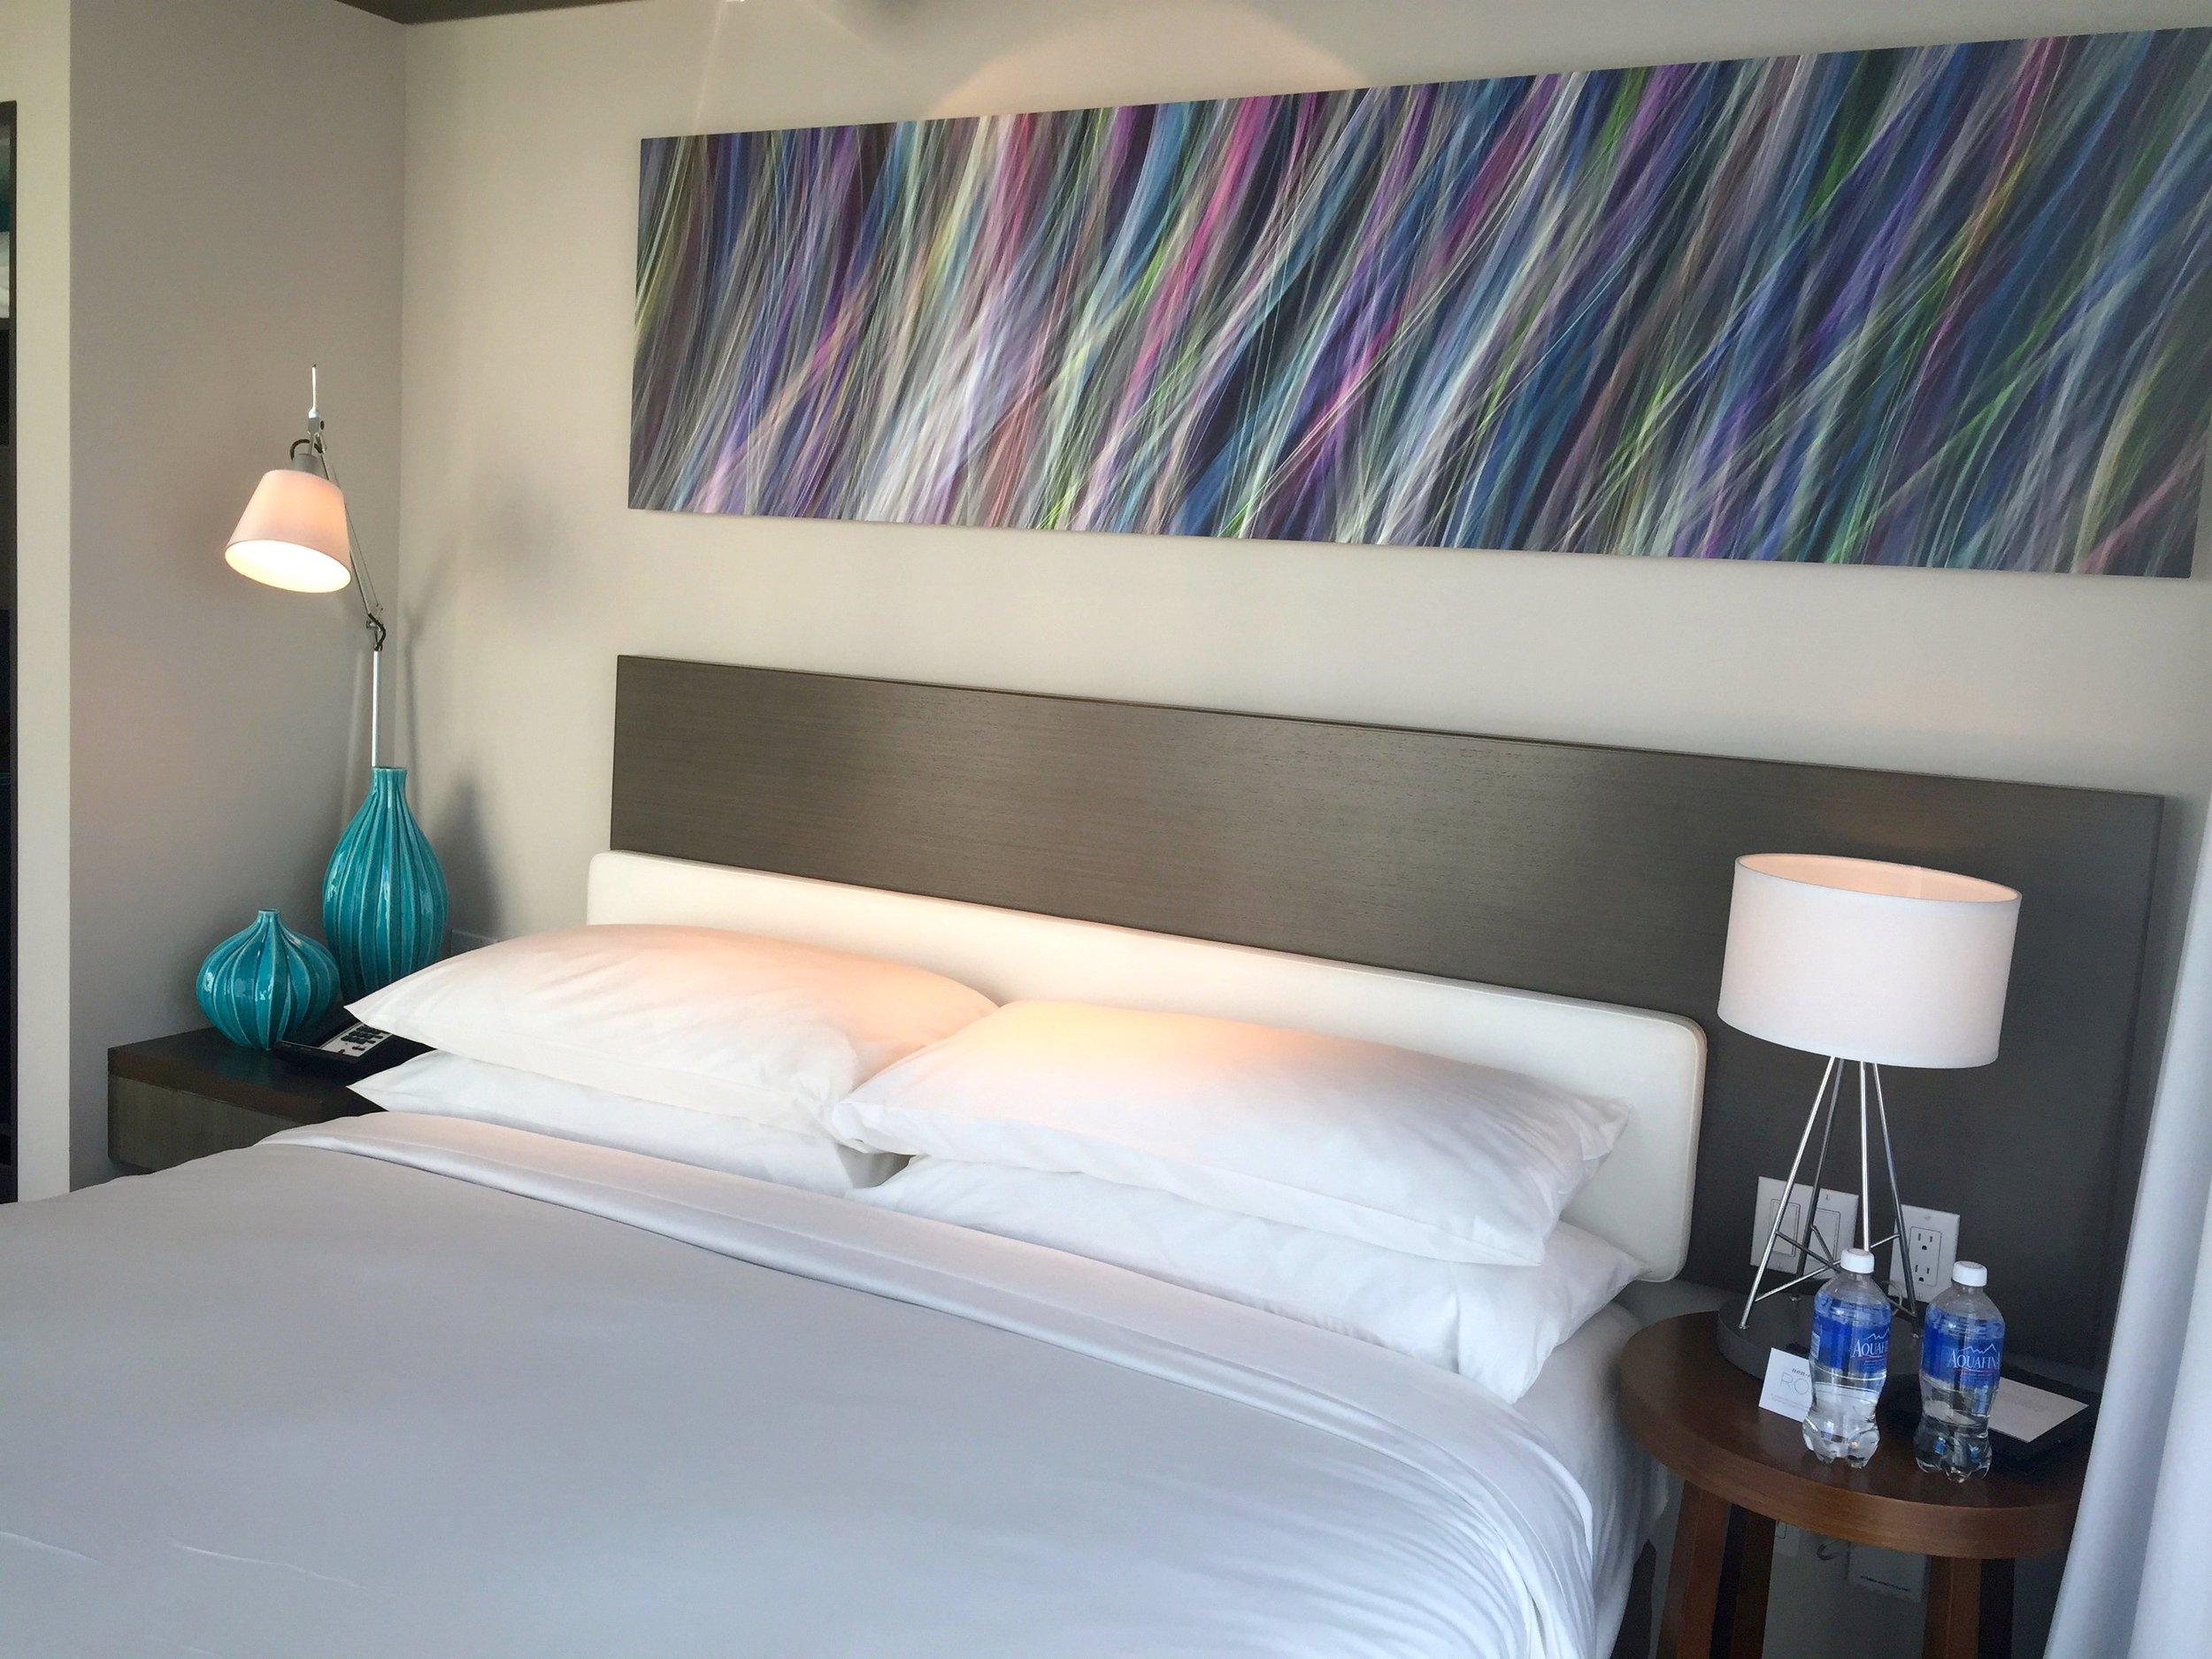 Hyatt Centric Hotel, Miami FL